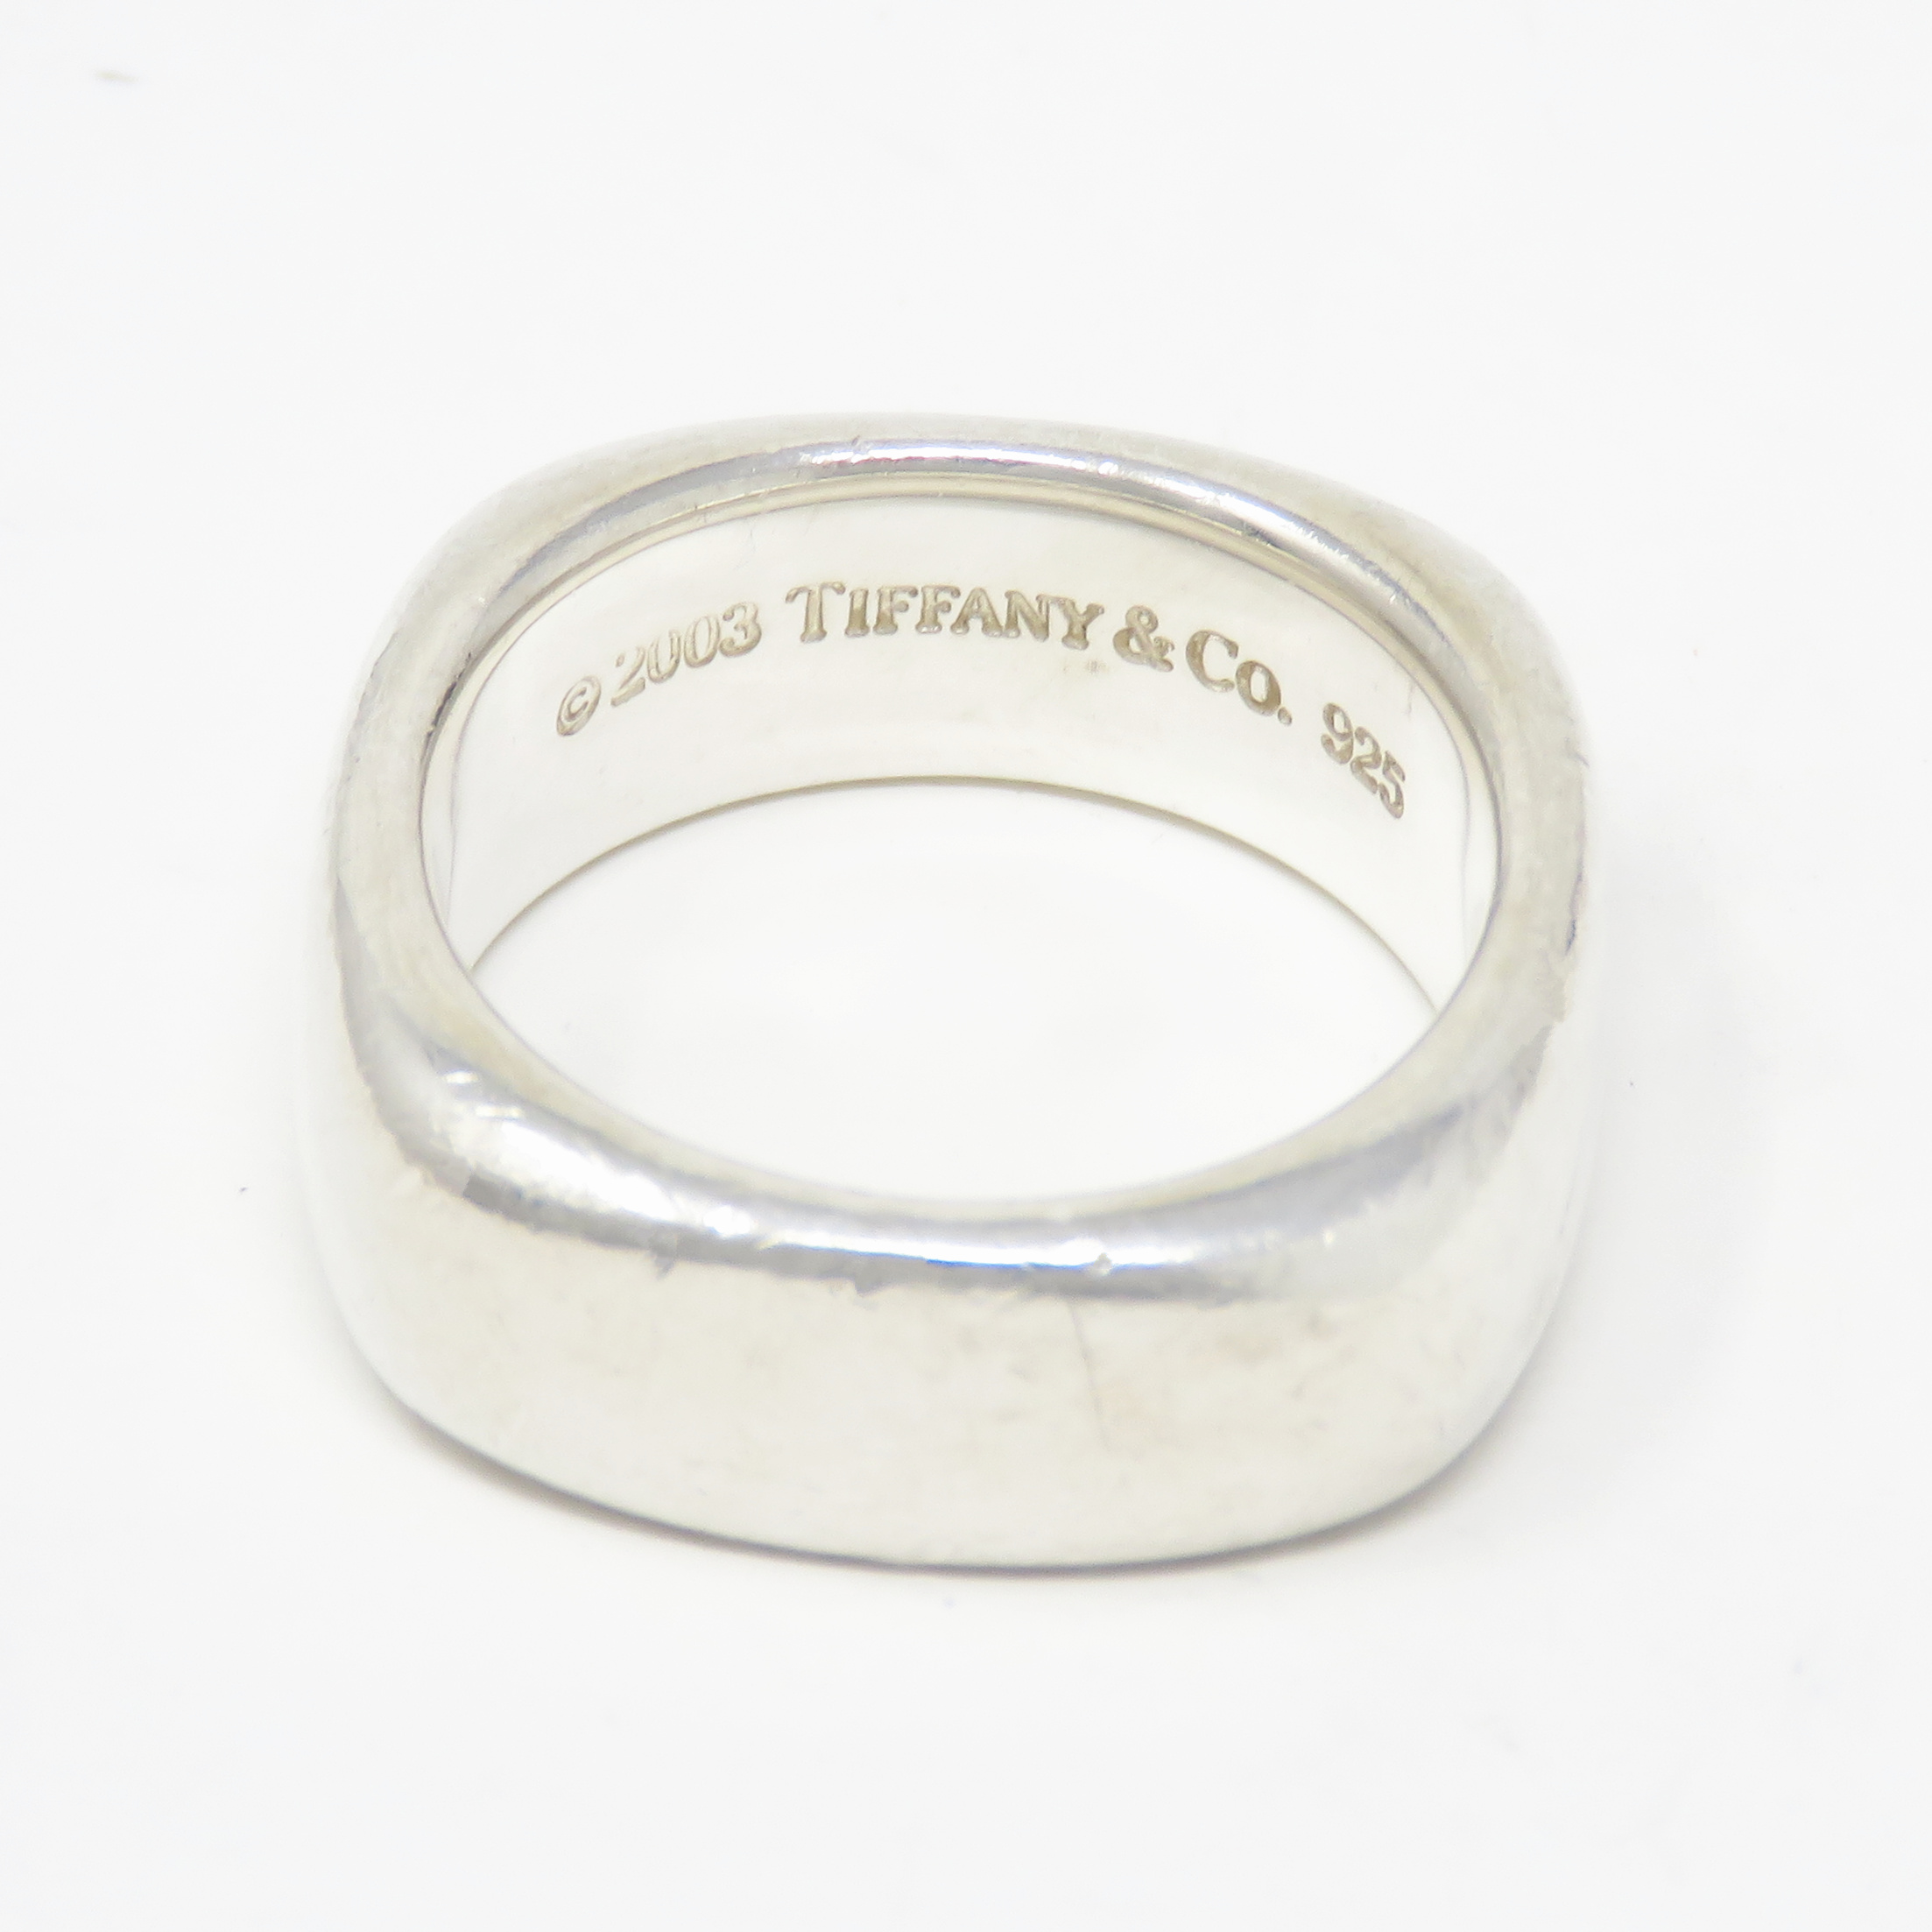 1d28eb6dd Nyjewel Tiffany Co 925 Sterling Silver 2003 8mm Wide Square